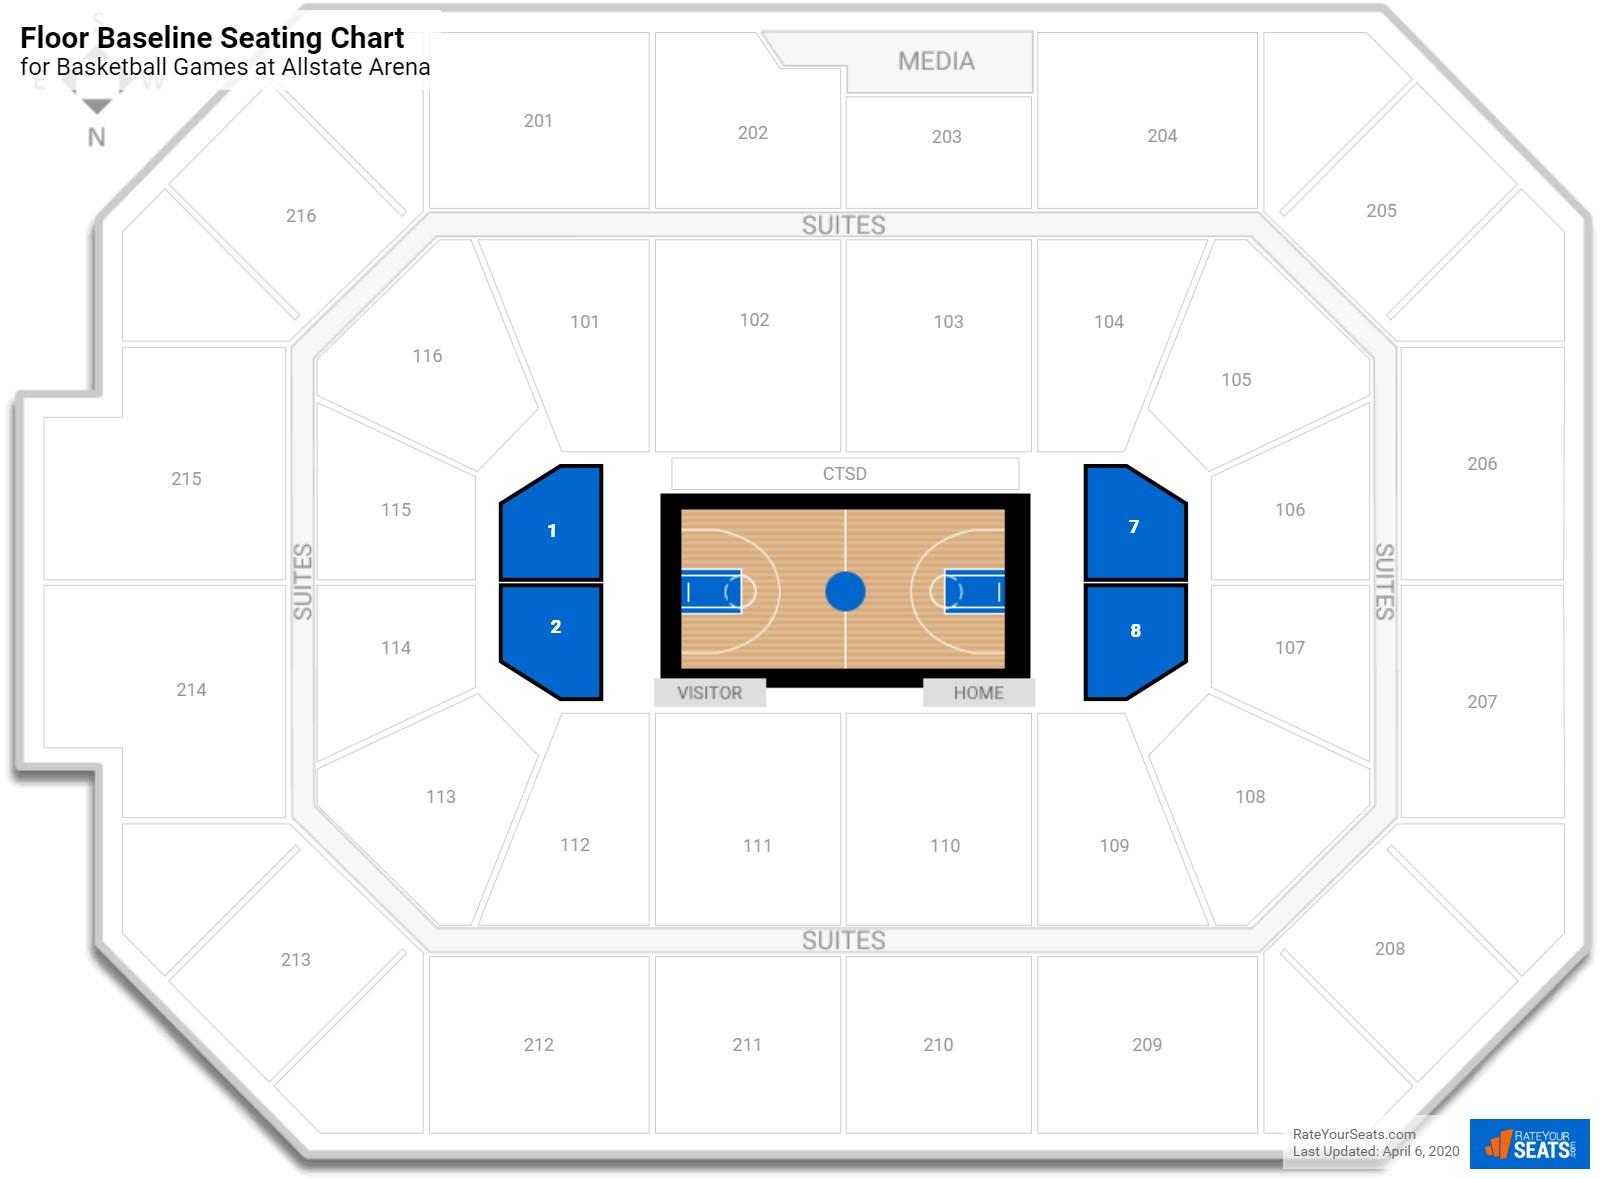 Allstate Arena Floor Baseline Seating Chart